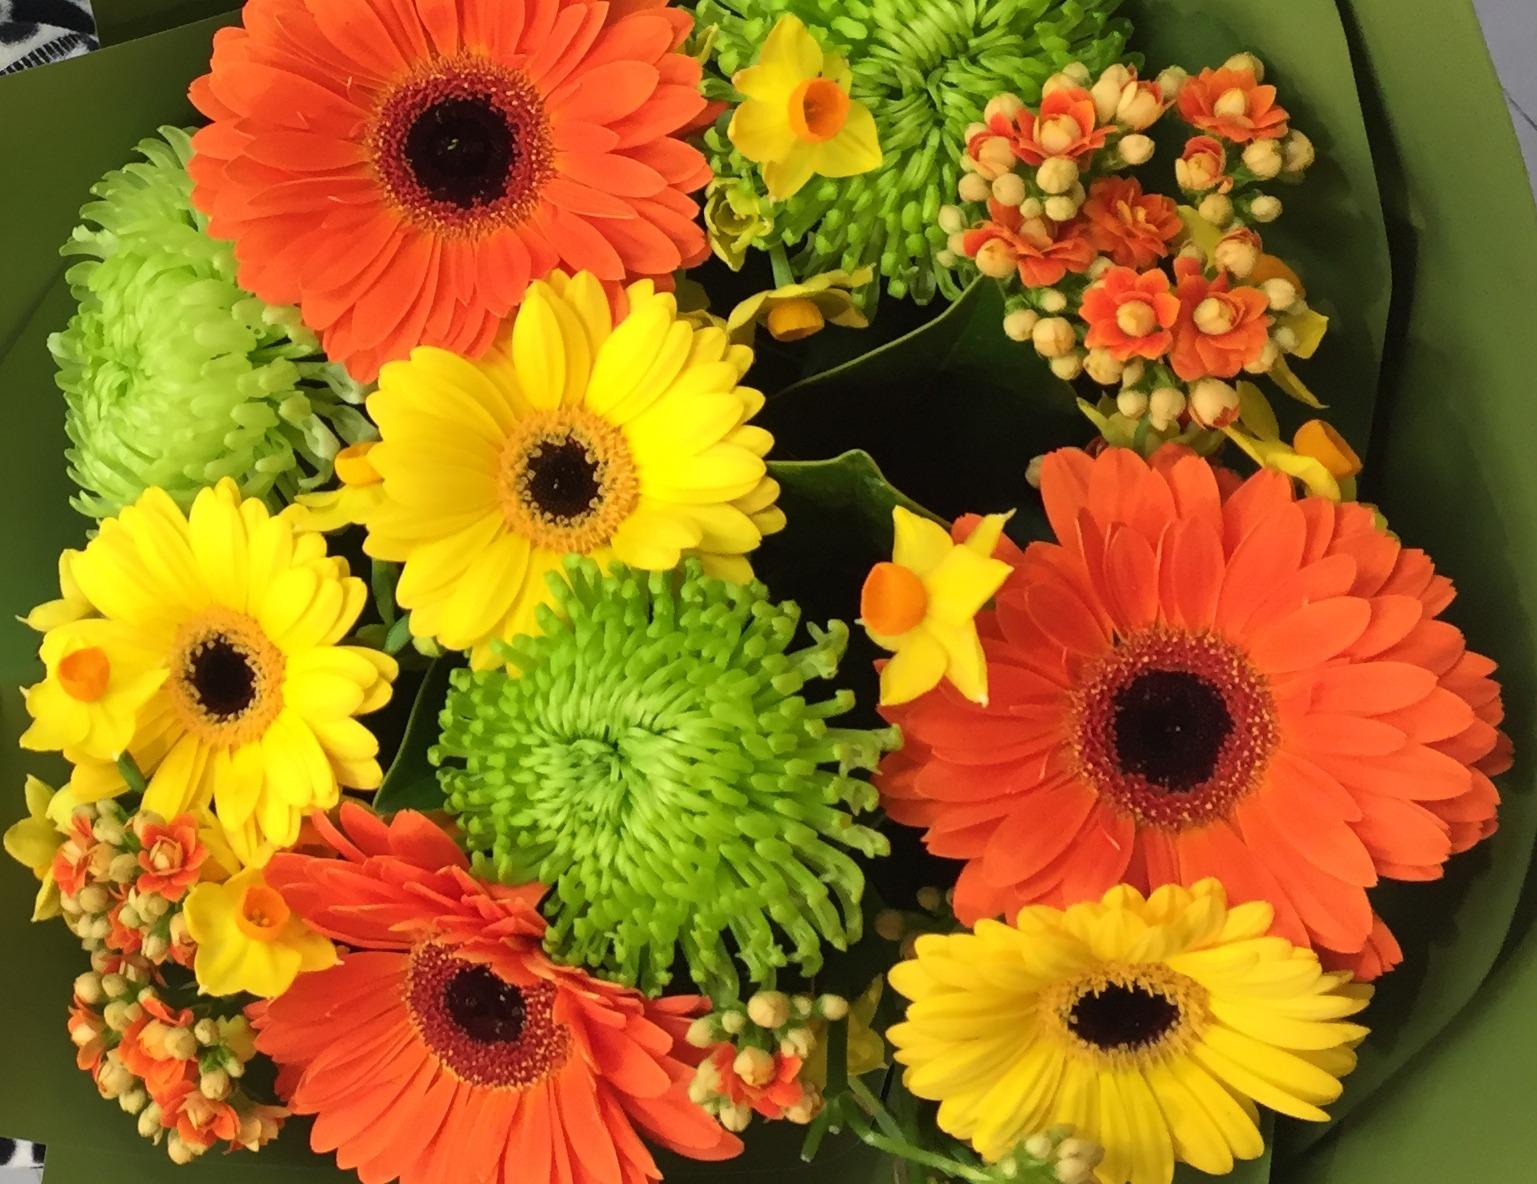 Andrea's Florist Ltd Avonhead